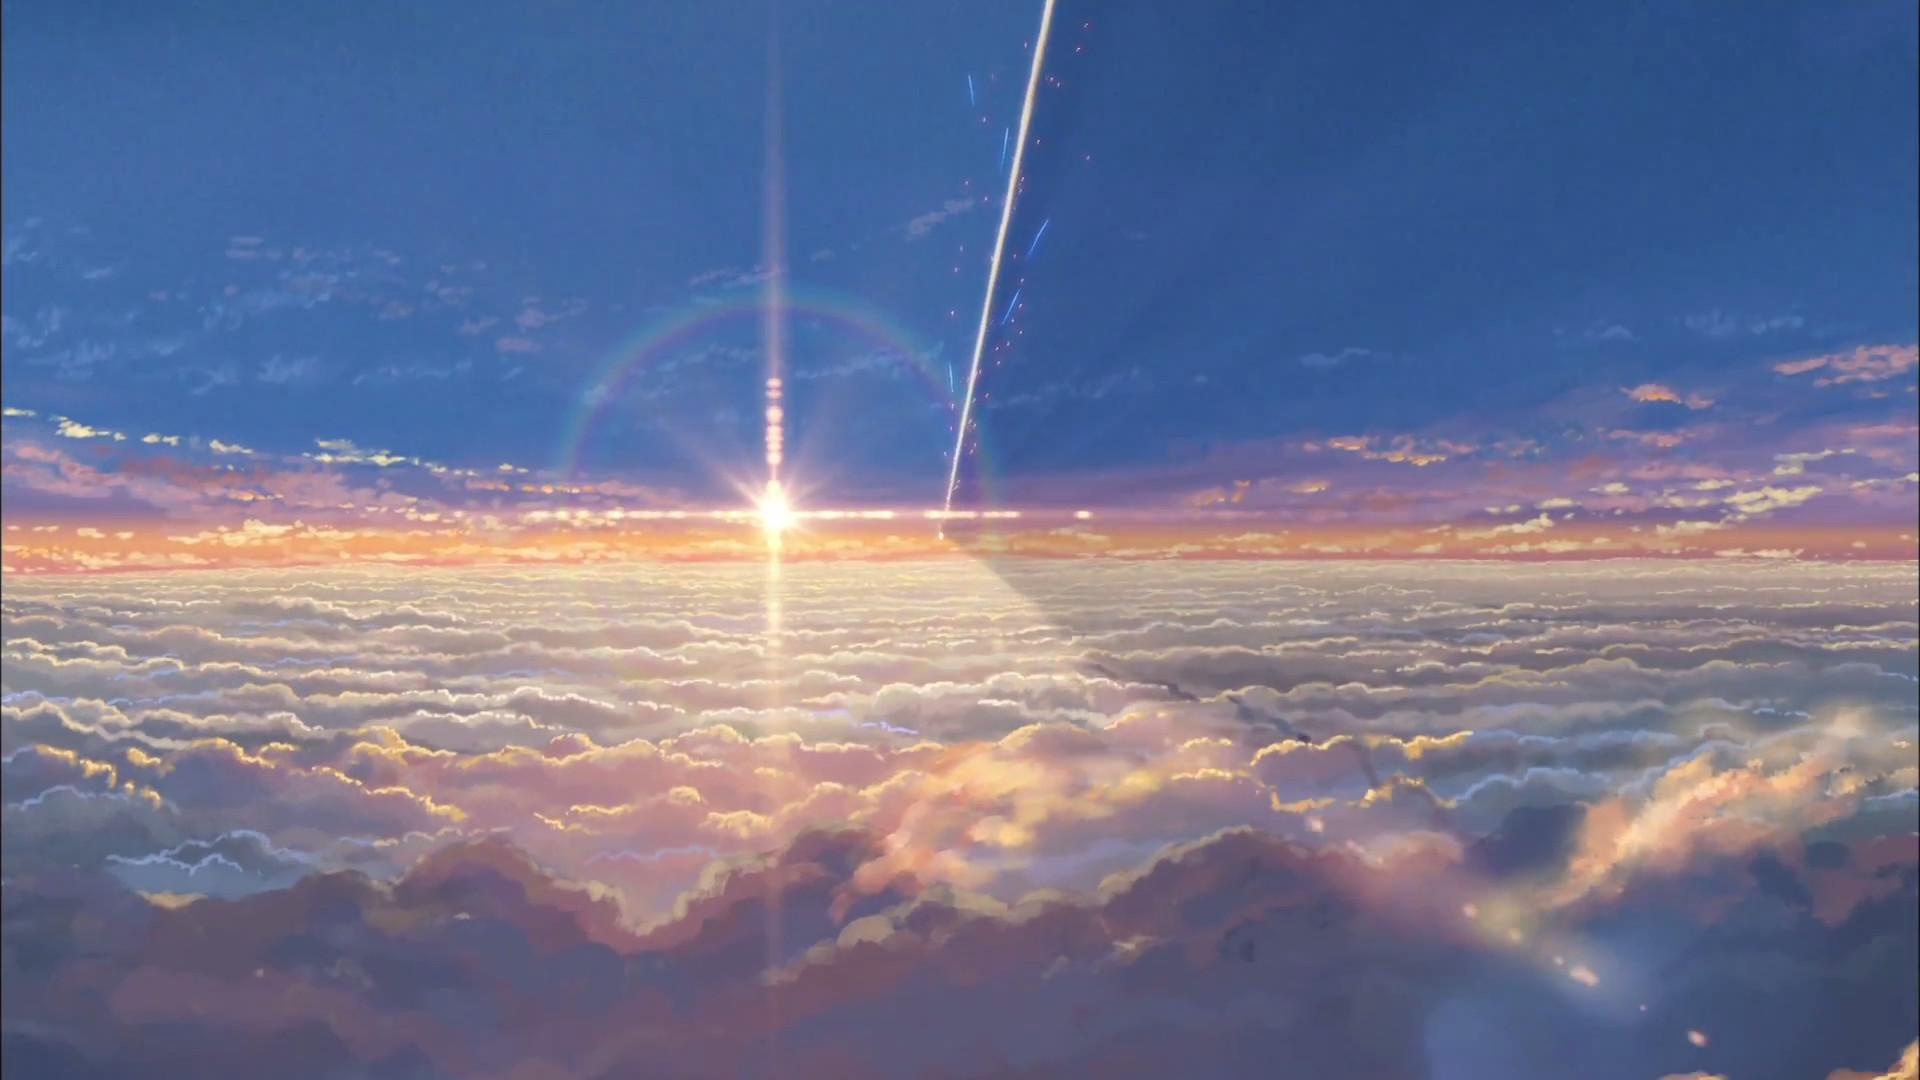 Cloud Sunset Painting Wallpaper